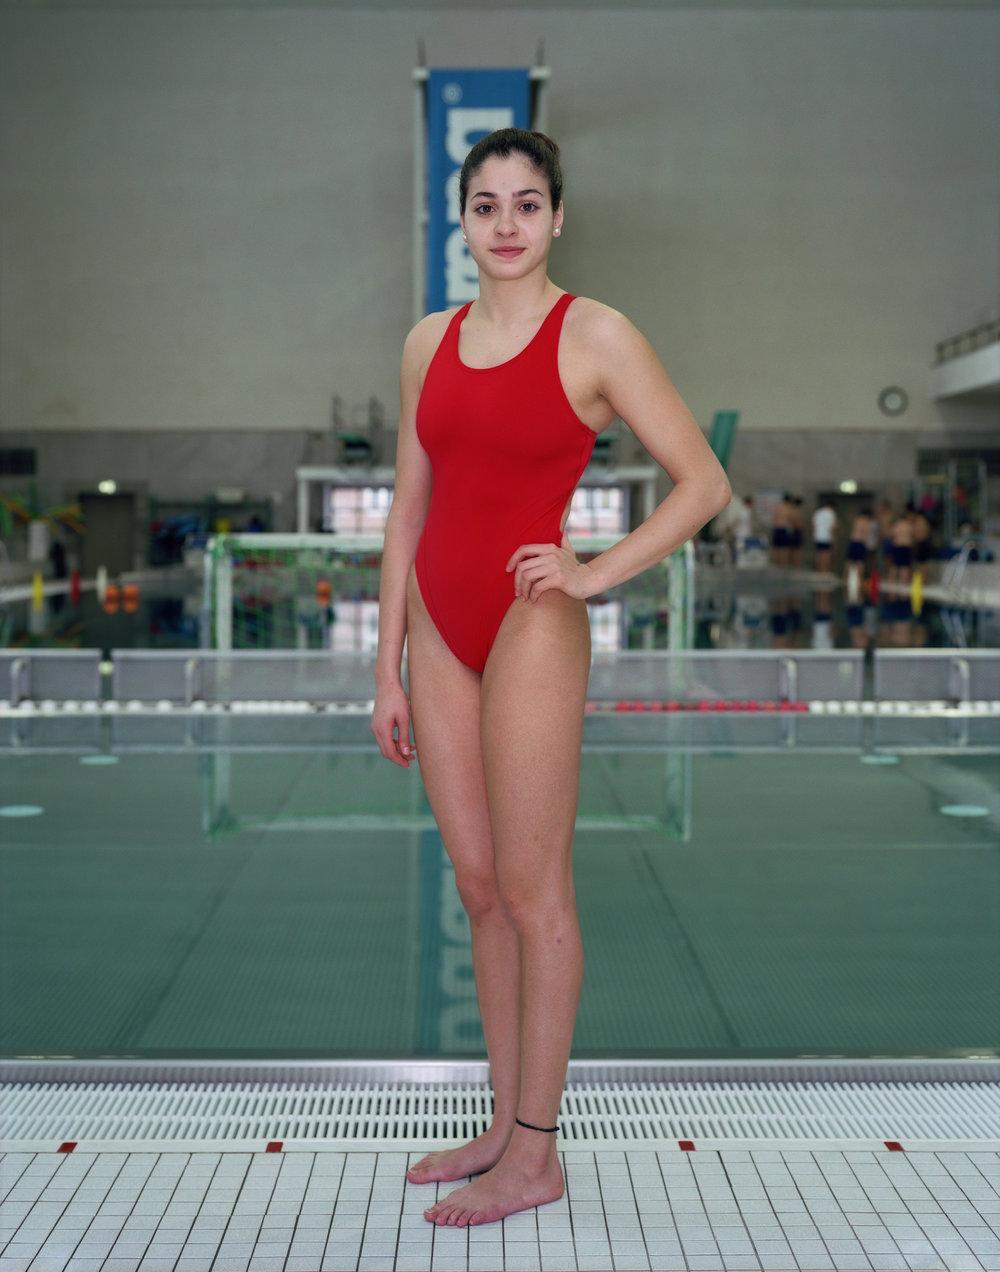 Yusra Mardini by Rineke Dijkstra